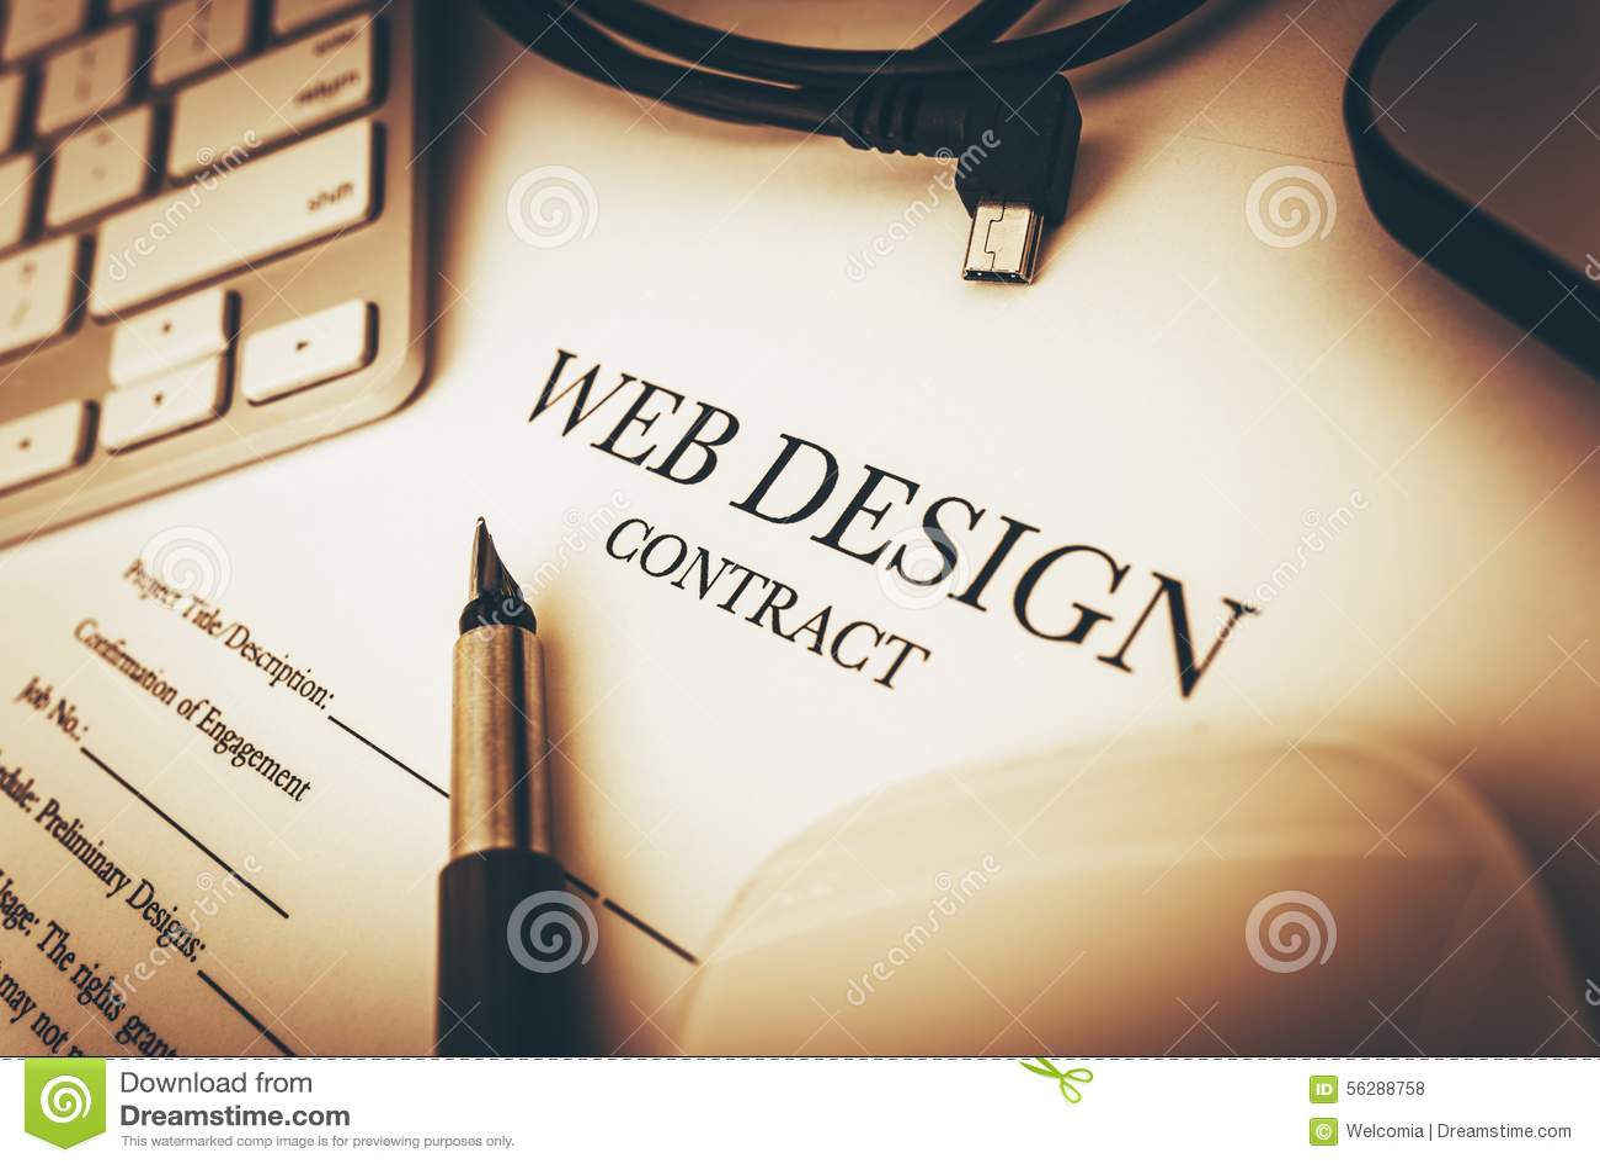 Contrat de web design